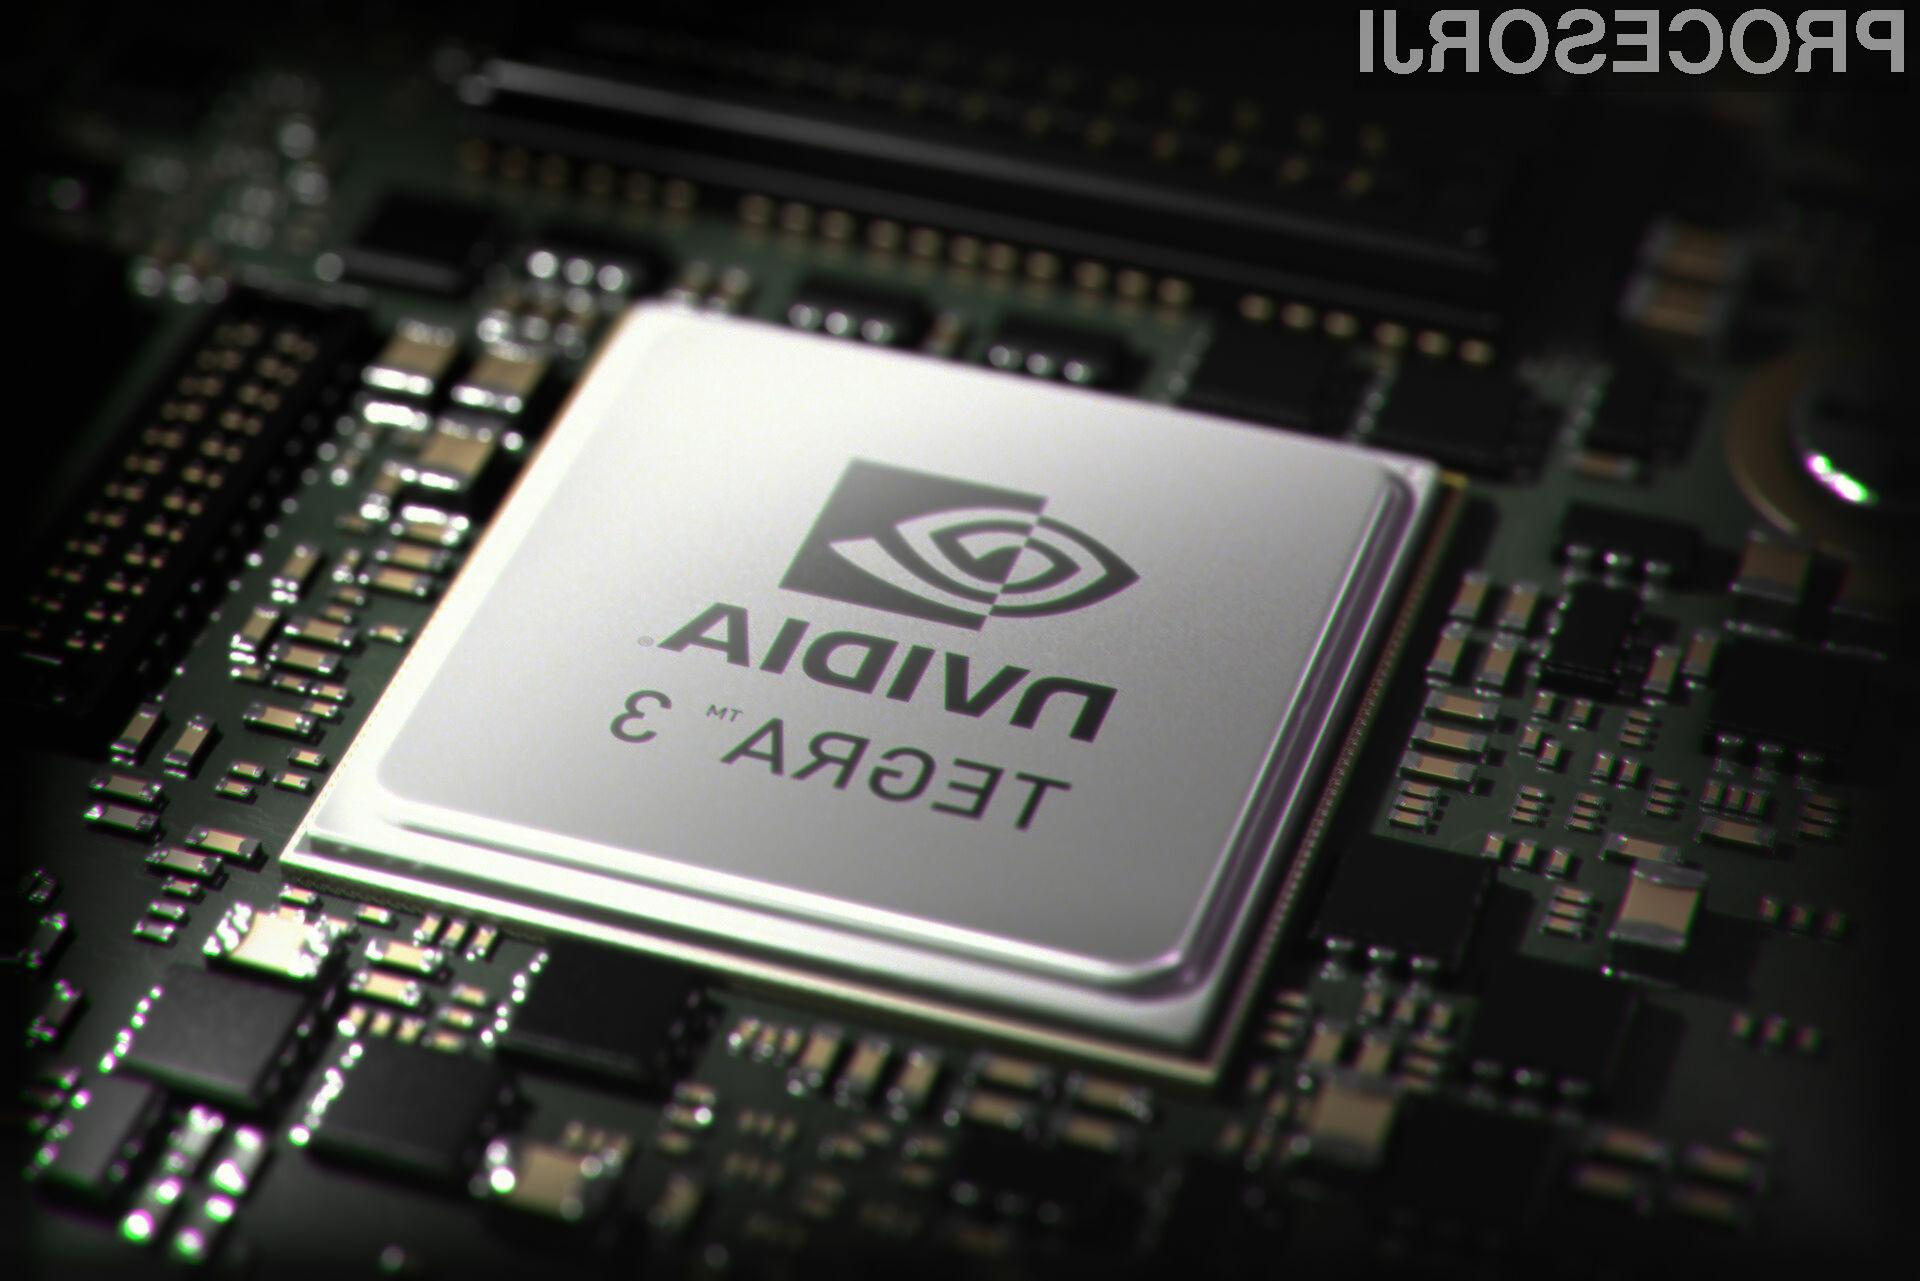 Konkretno je v Tegri 3 pet jeder izvedenih v arhitekturi ARM Cortex A9.